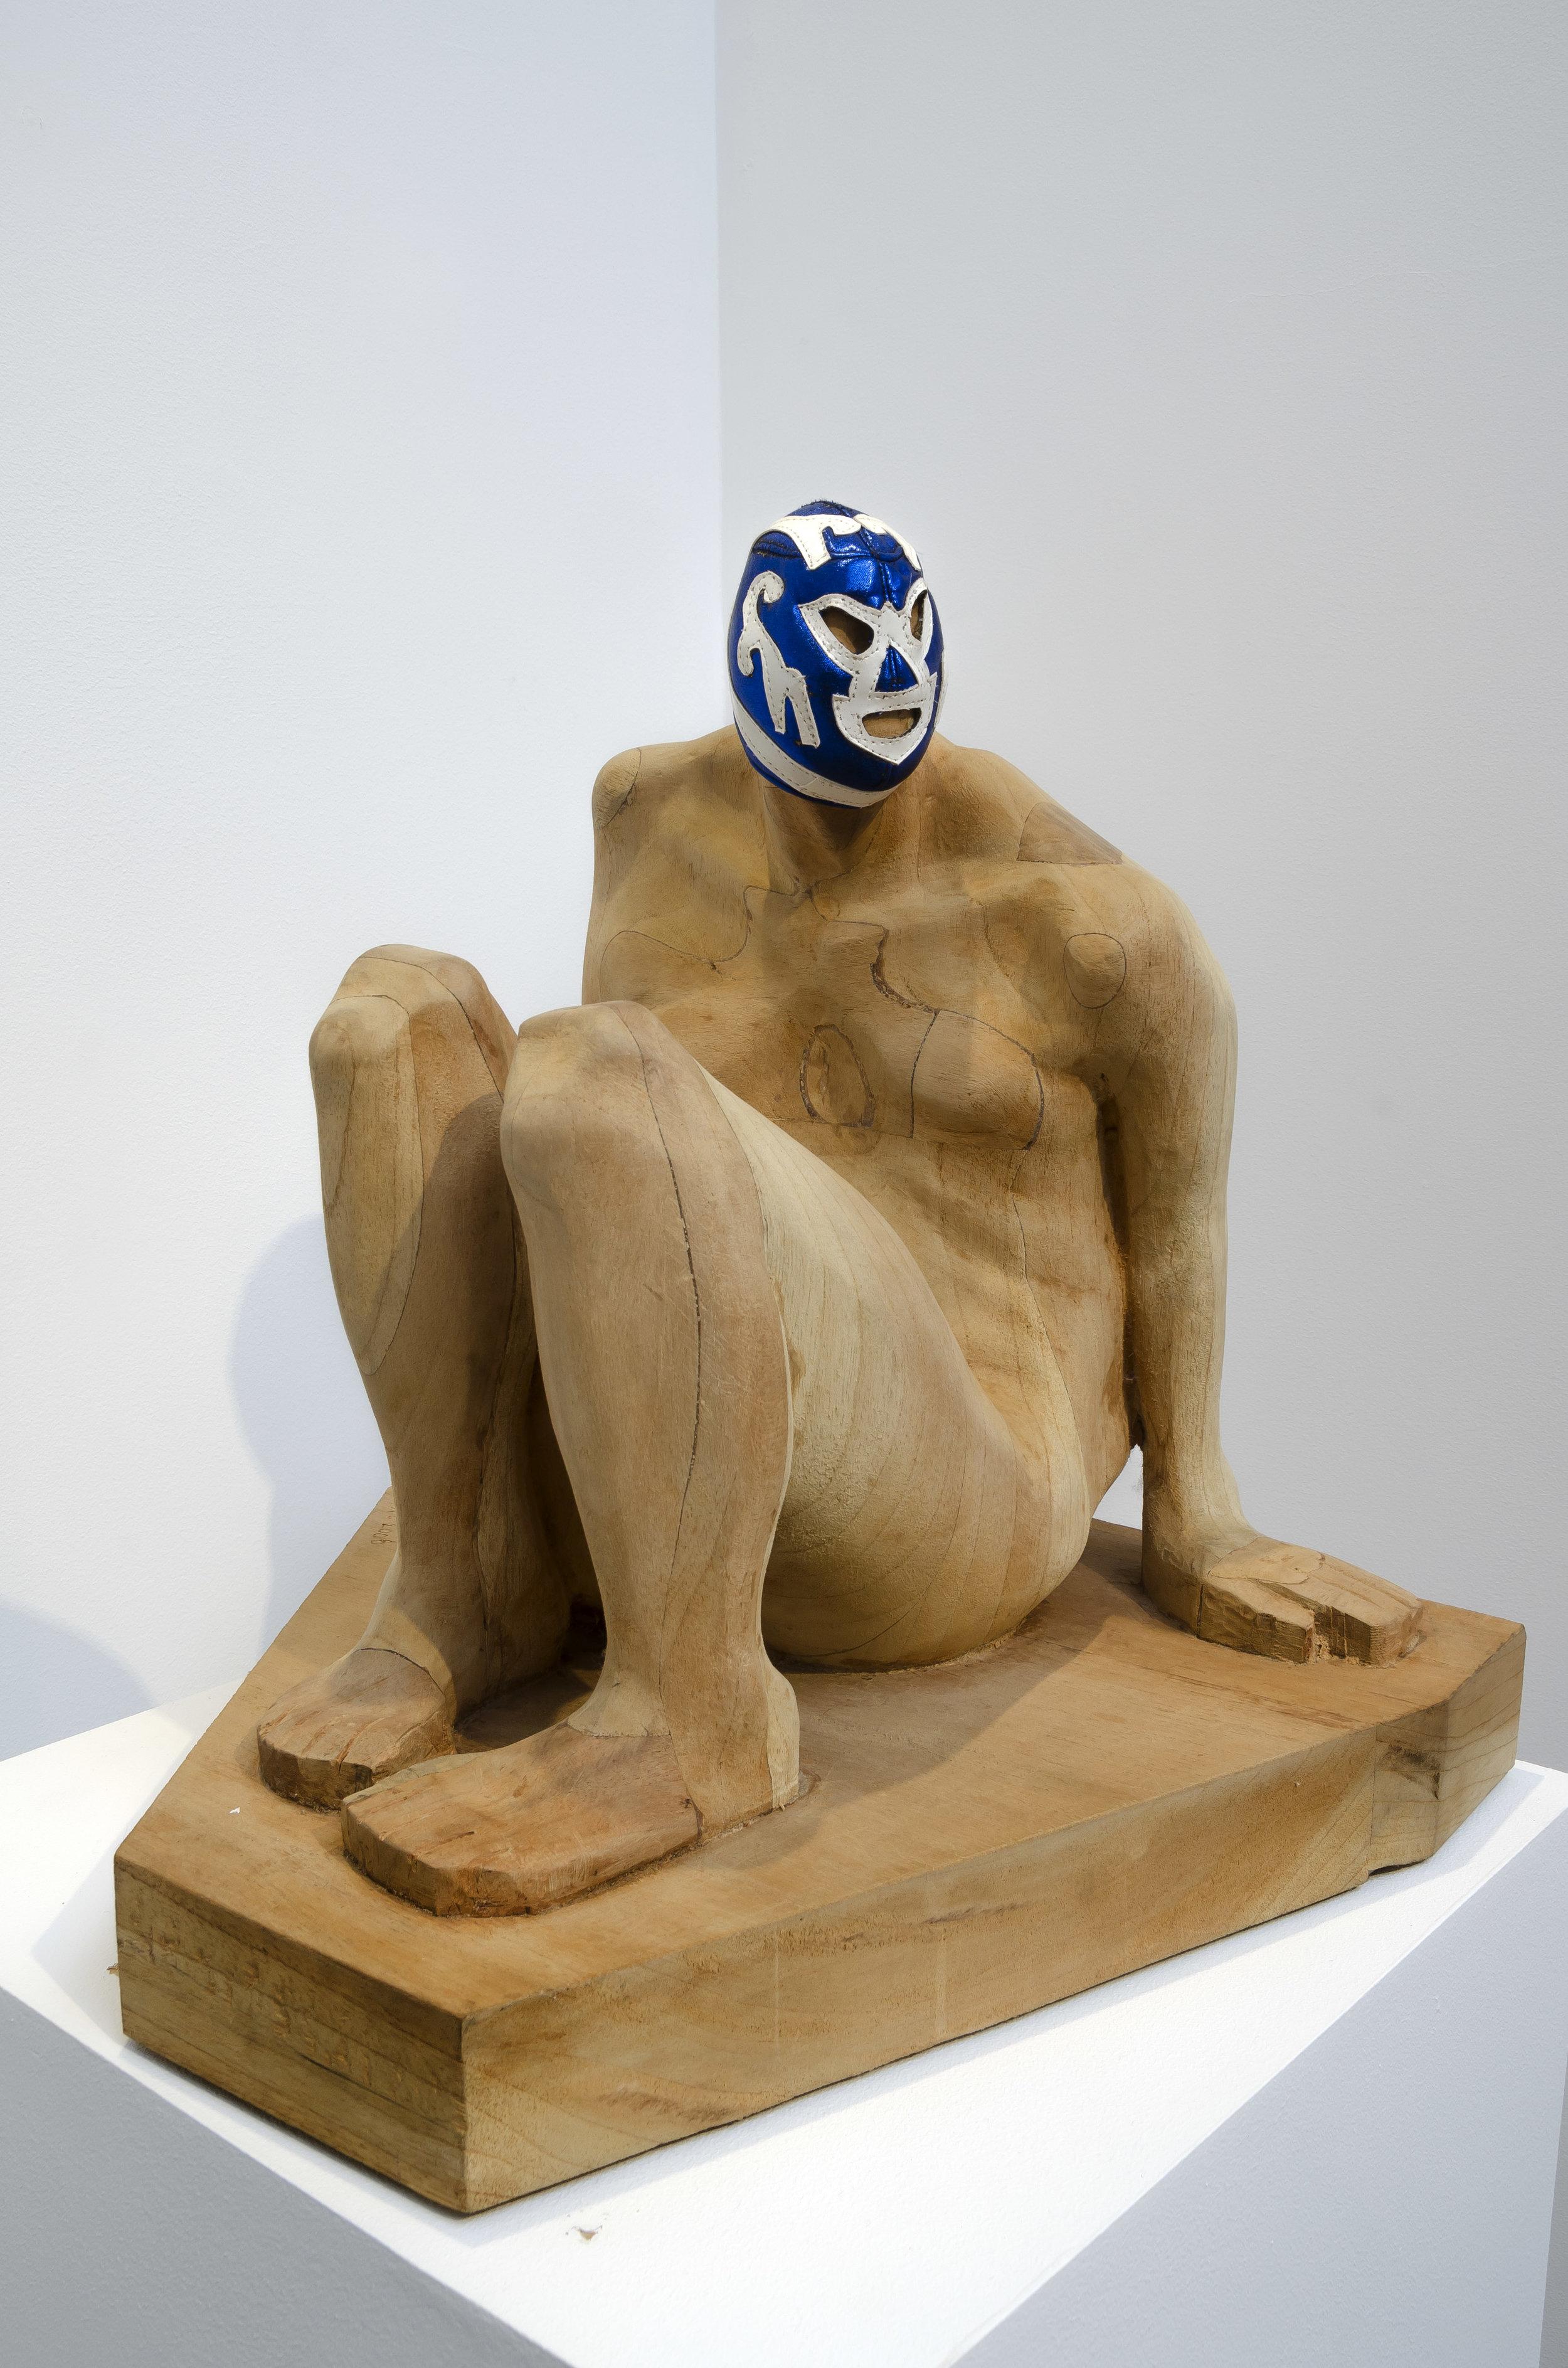 Armando Romero (b. 1964)   Seated Pride , 2008  wood and vinyl 15 3/4 x 16 x 15 1/2 inches; 40 x 40.6 x 39.4 centimeters